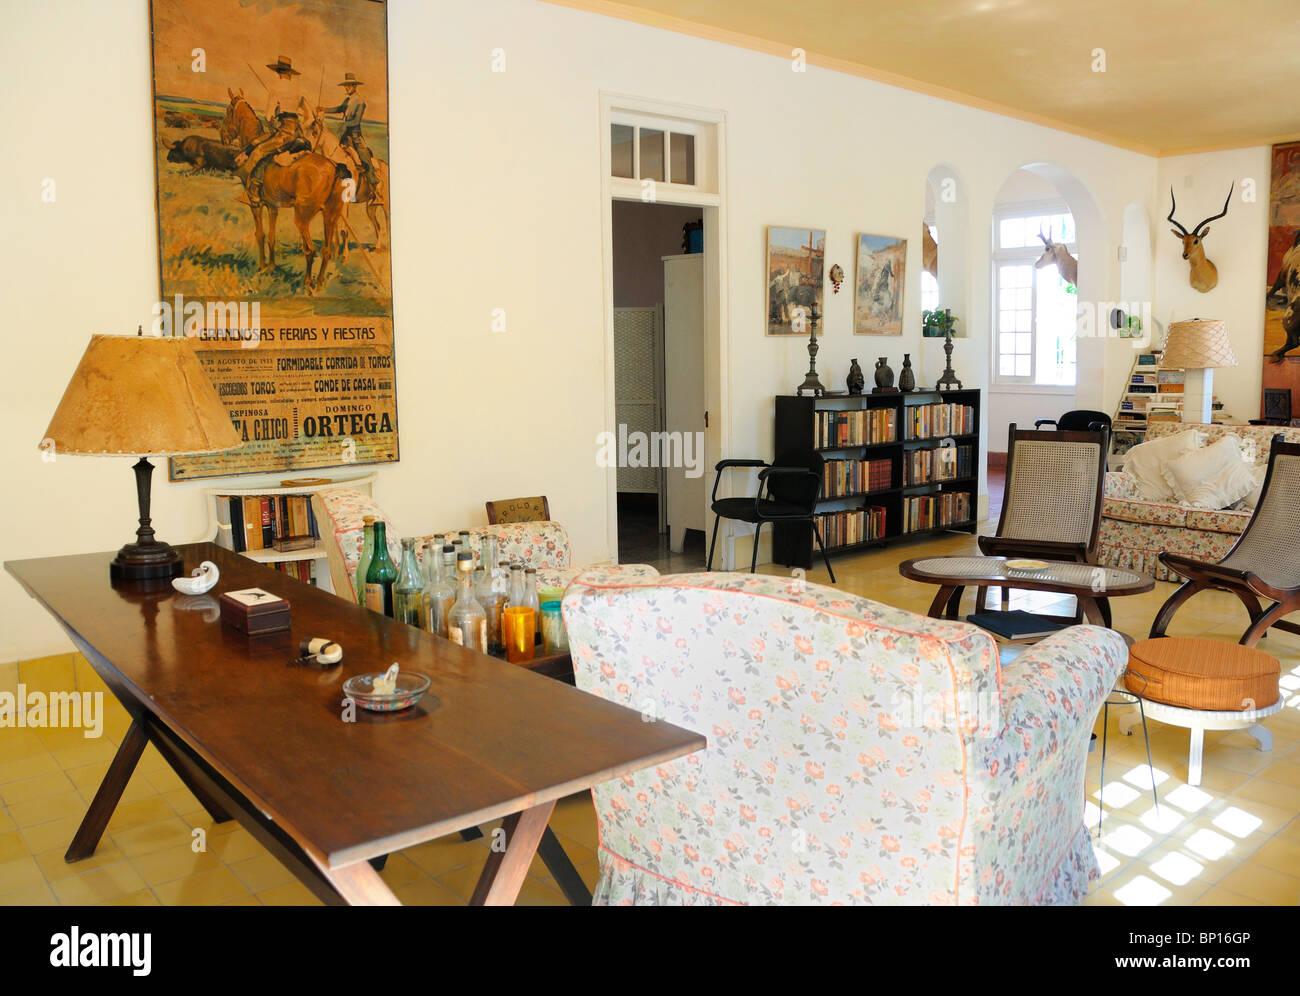 Detail from Ernest Hemingway´s living room at Finca Vigia in San Francisco de Paula, Cuba. Stock Photo